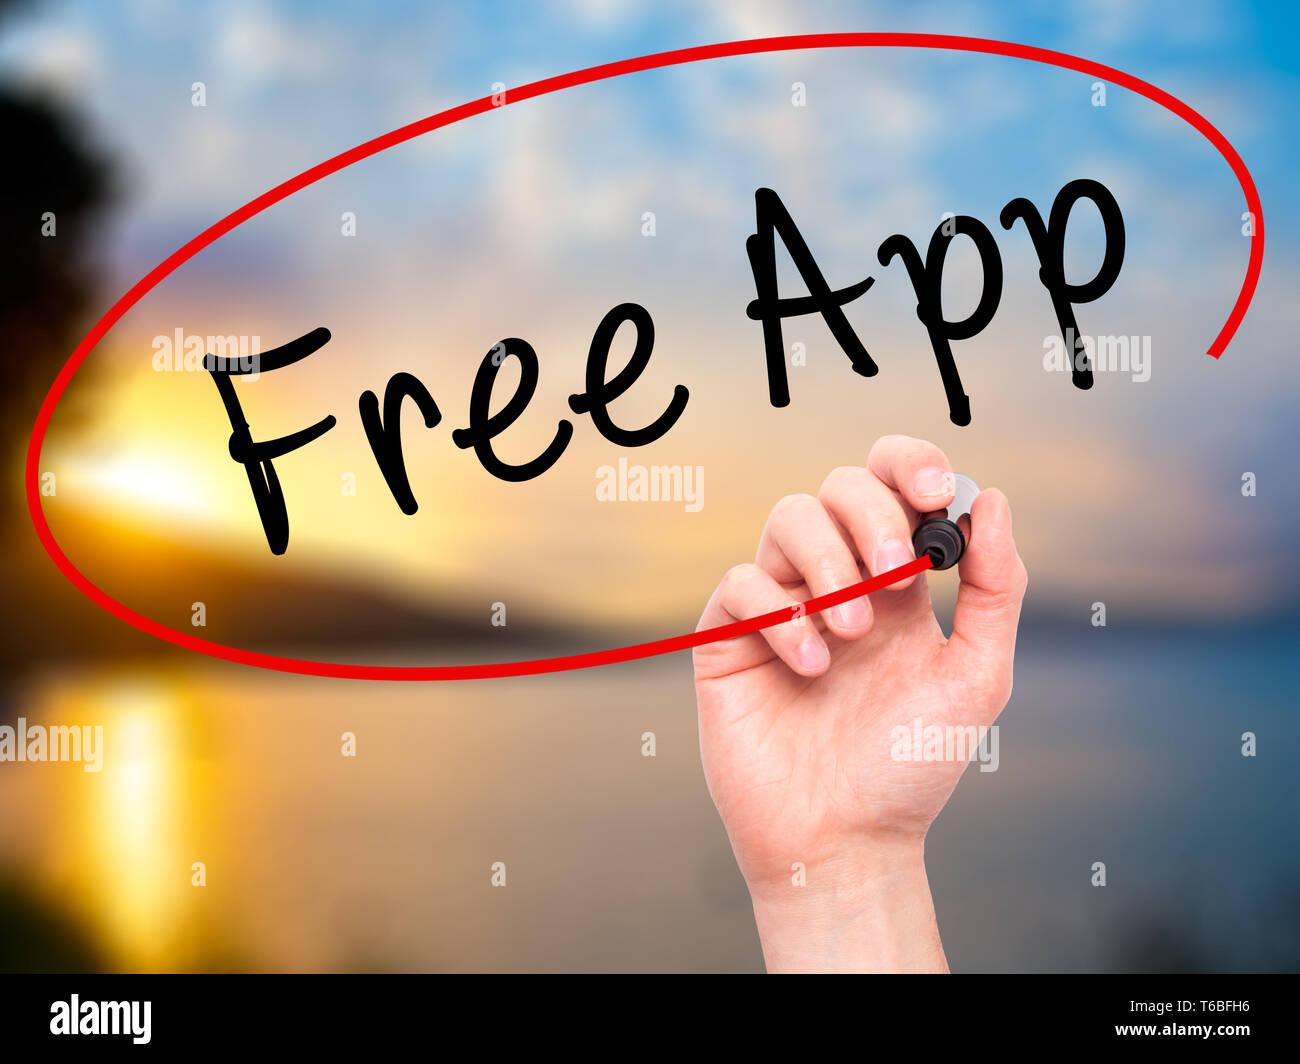 Calligraphy App Free